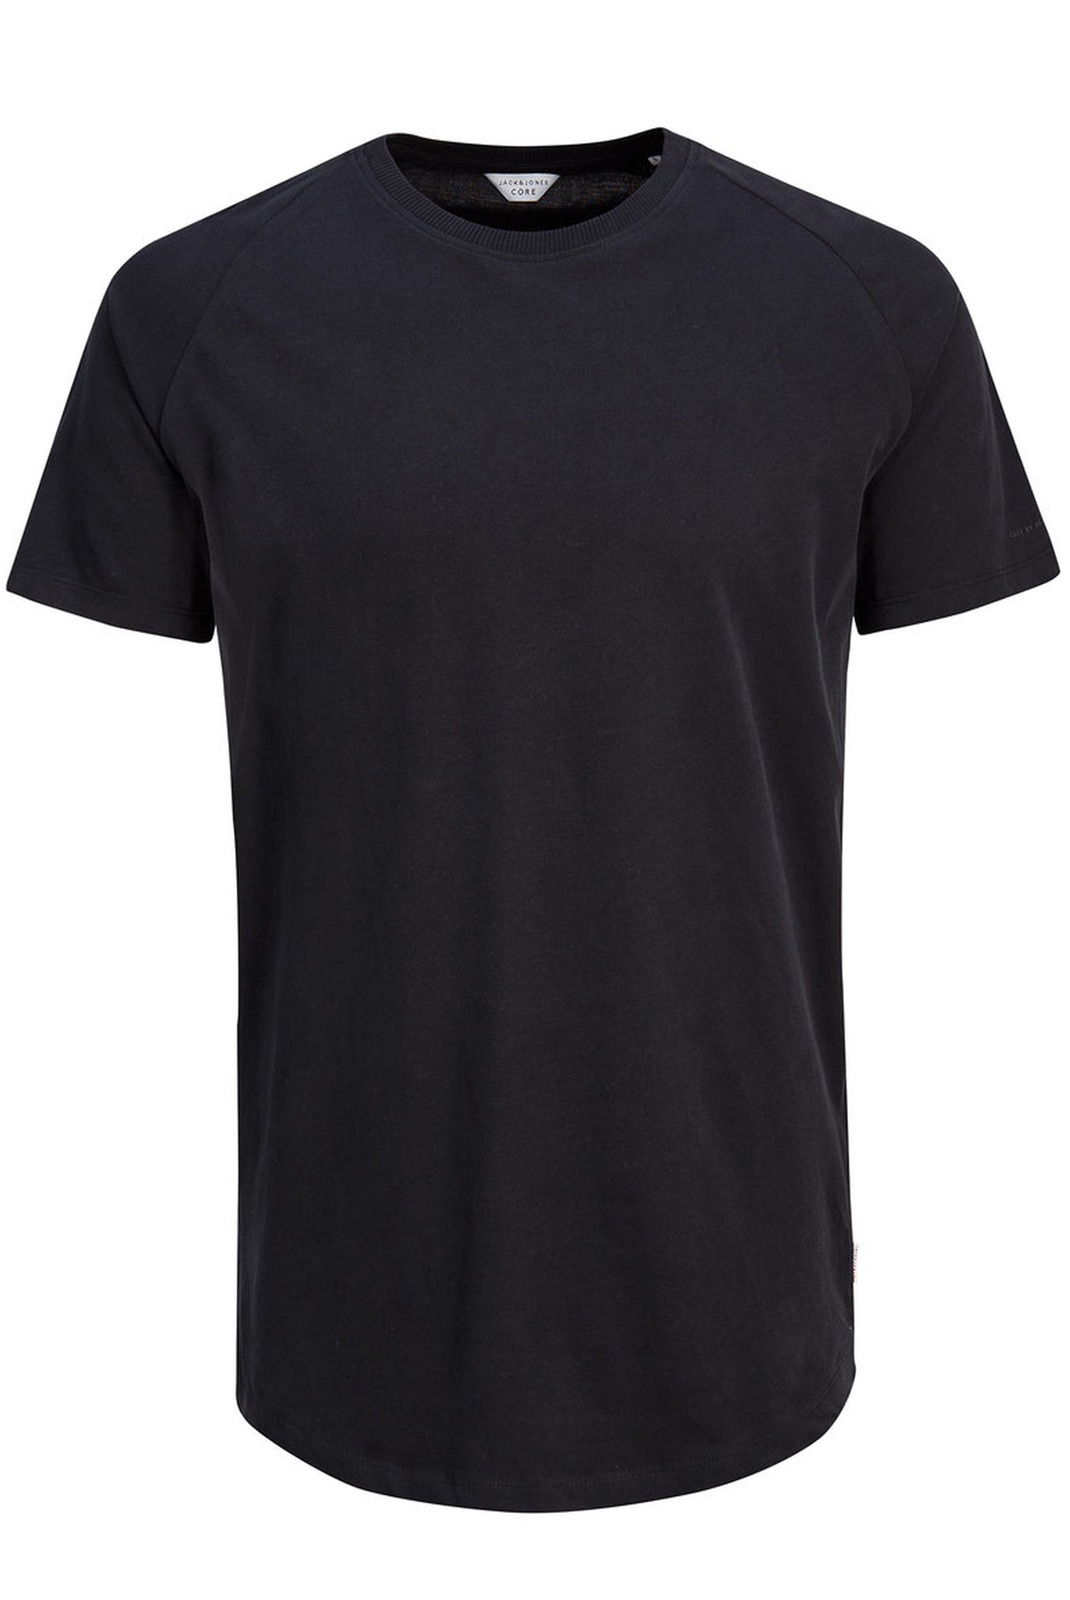 Tee-shirts  Jack & Jones RAFE TEE BLACK